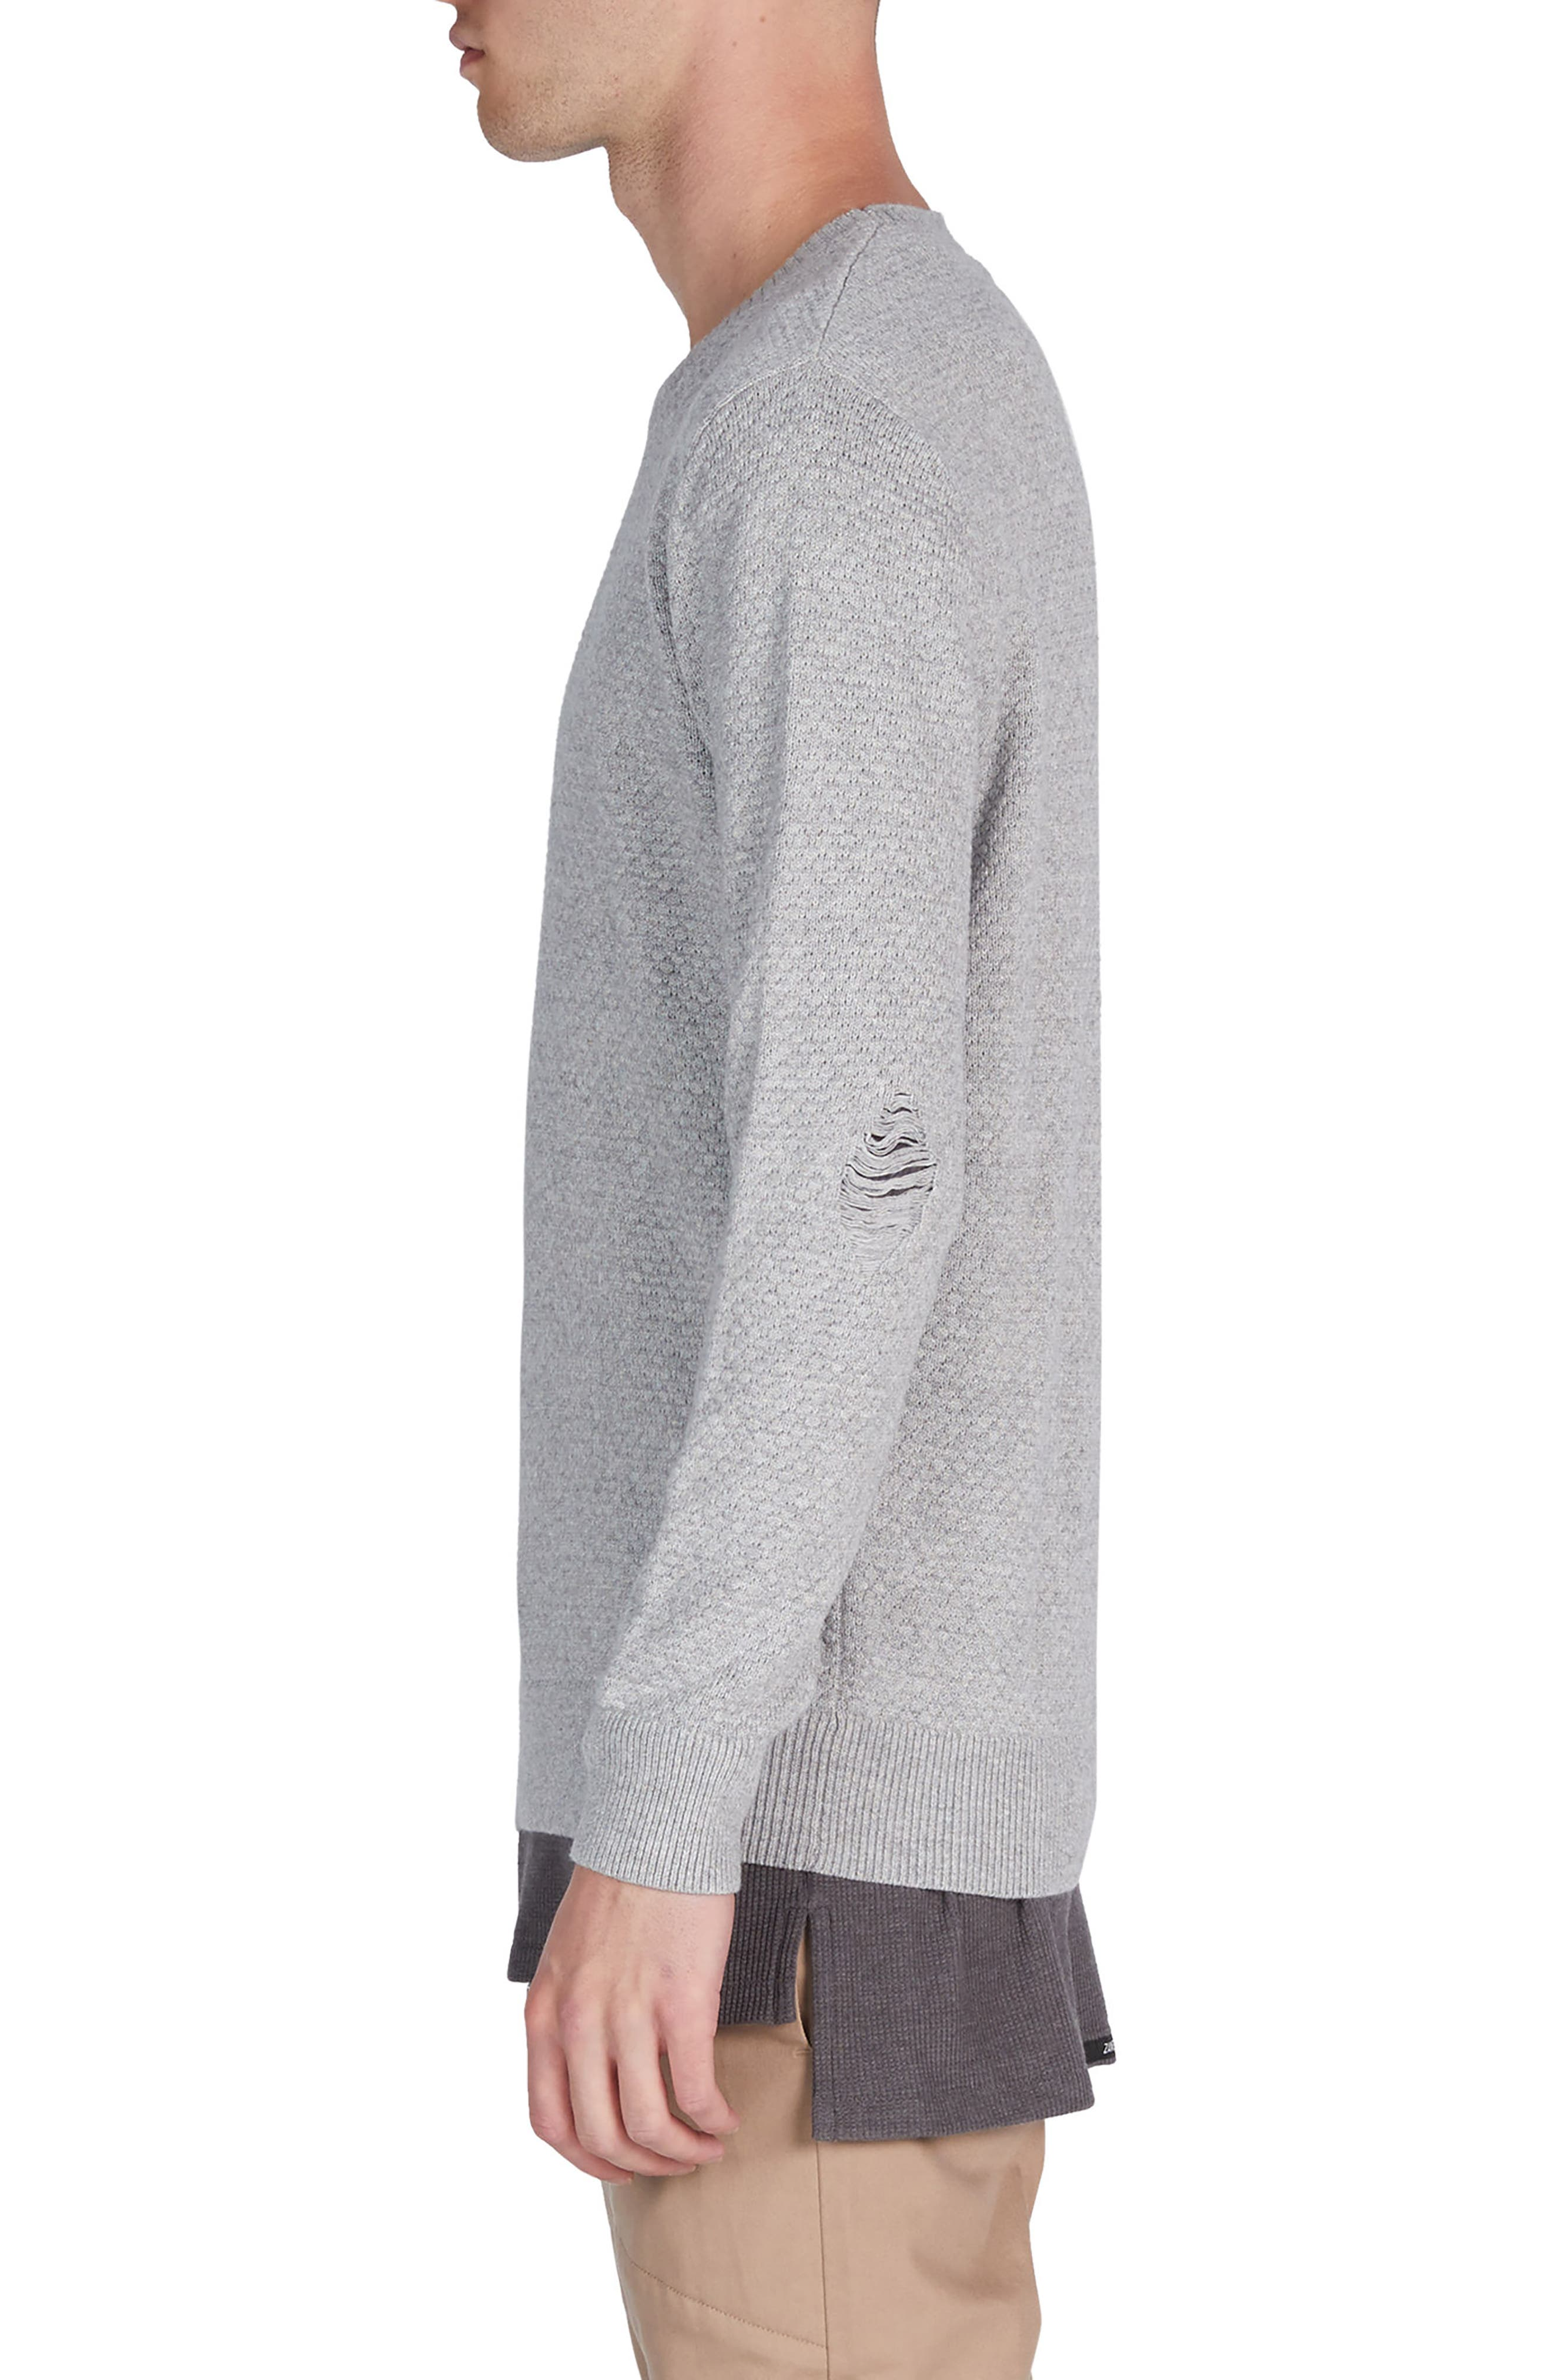 Grip Crewneck Sweater,                             Alternate thumbnail 3, color,                             Grey Marle